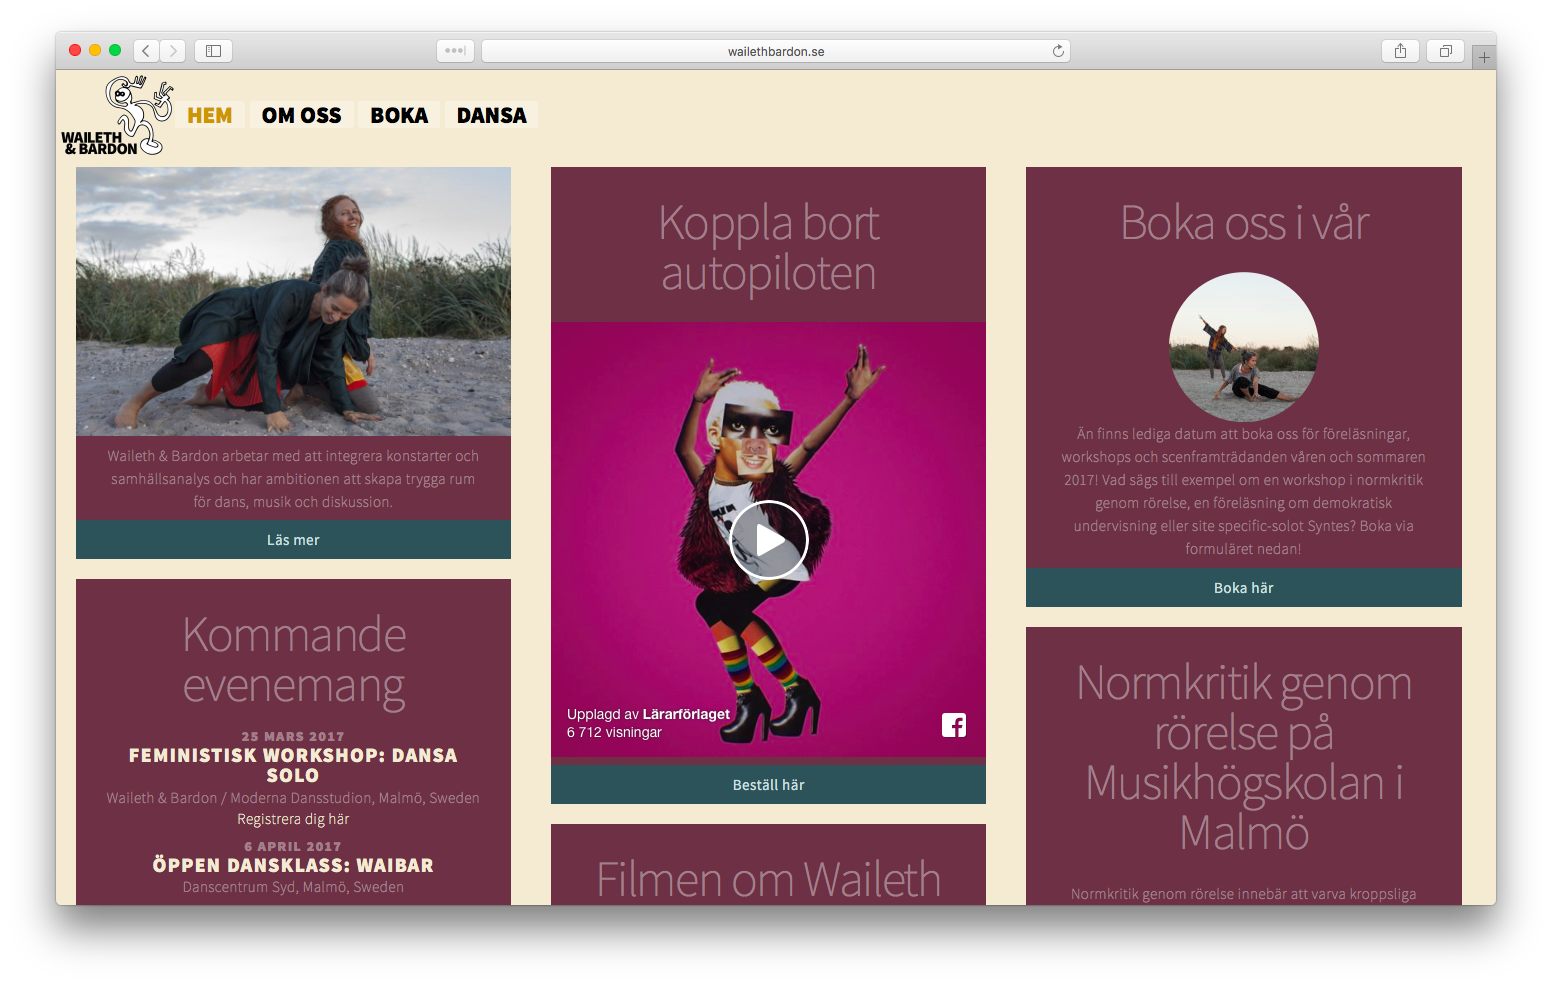 Waileth & Bardon webbplats